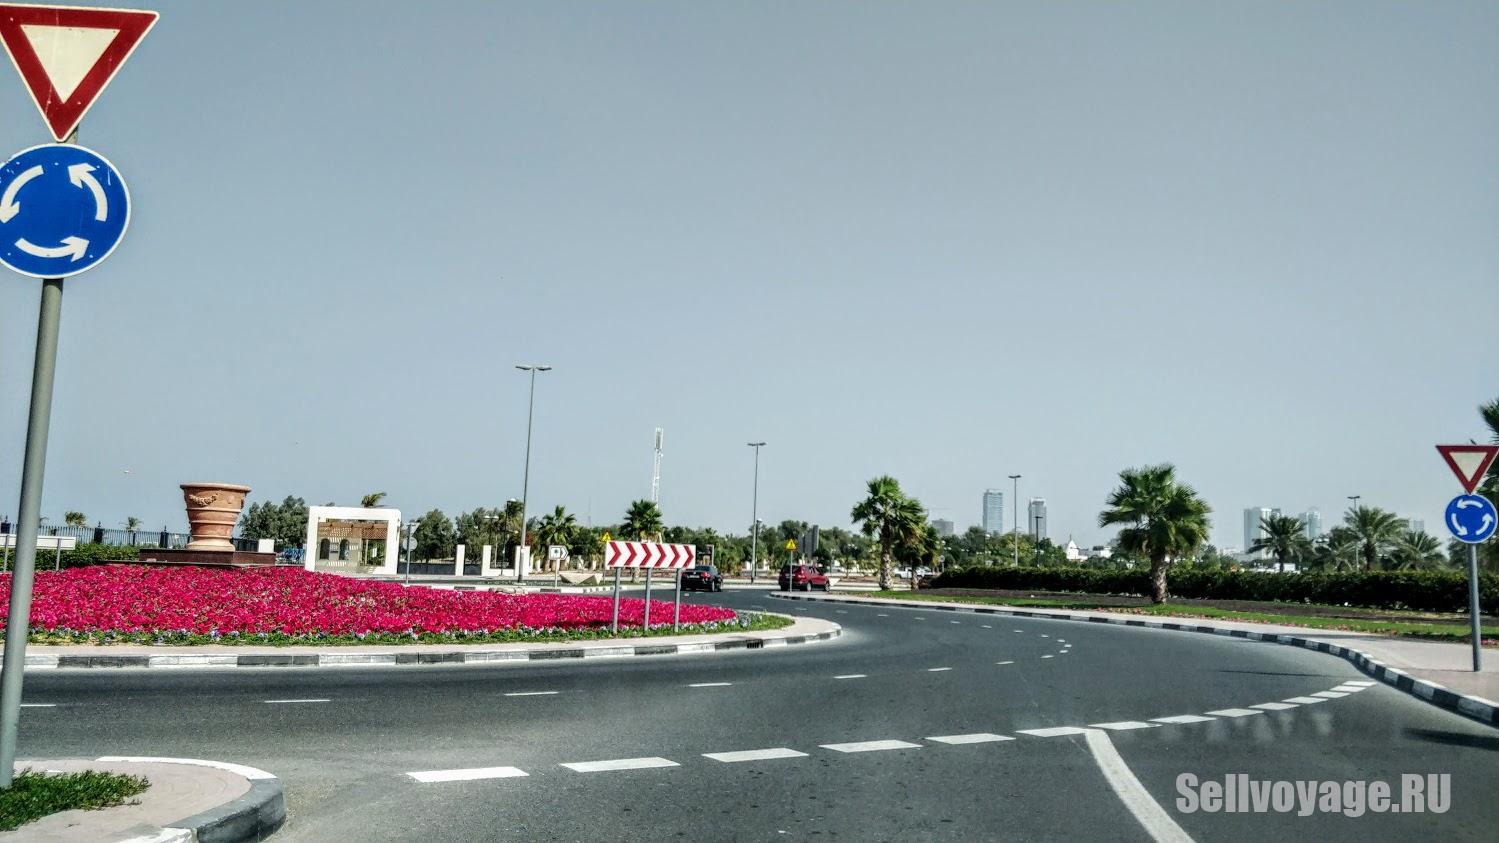 круговая развязка в Эмиратах